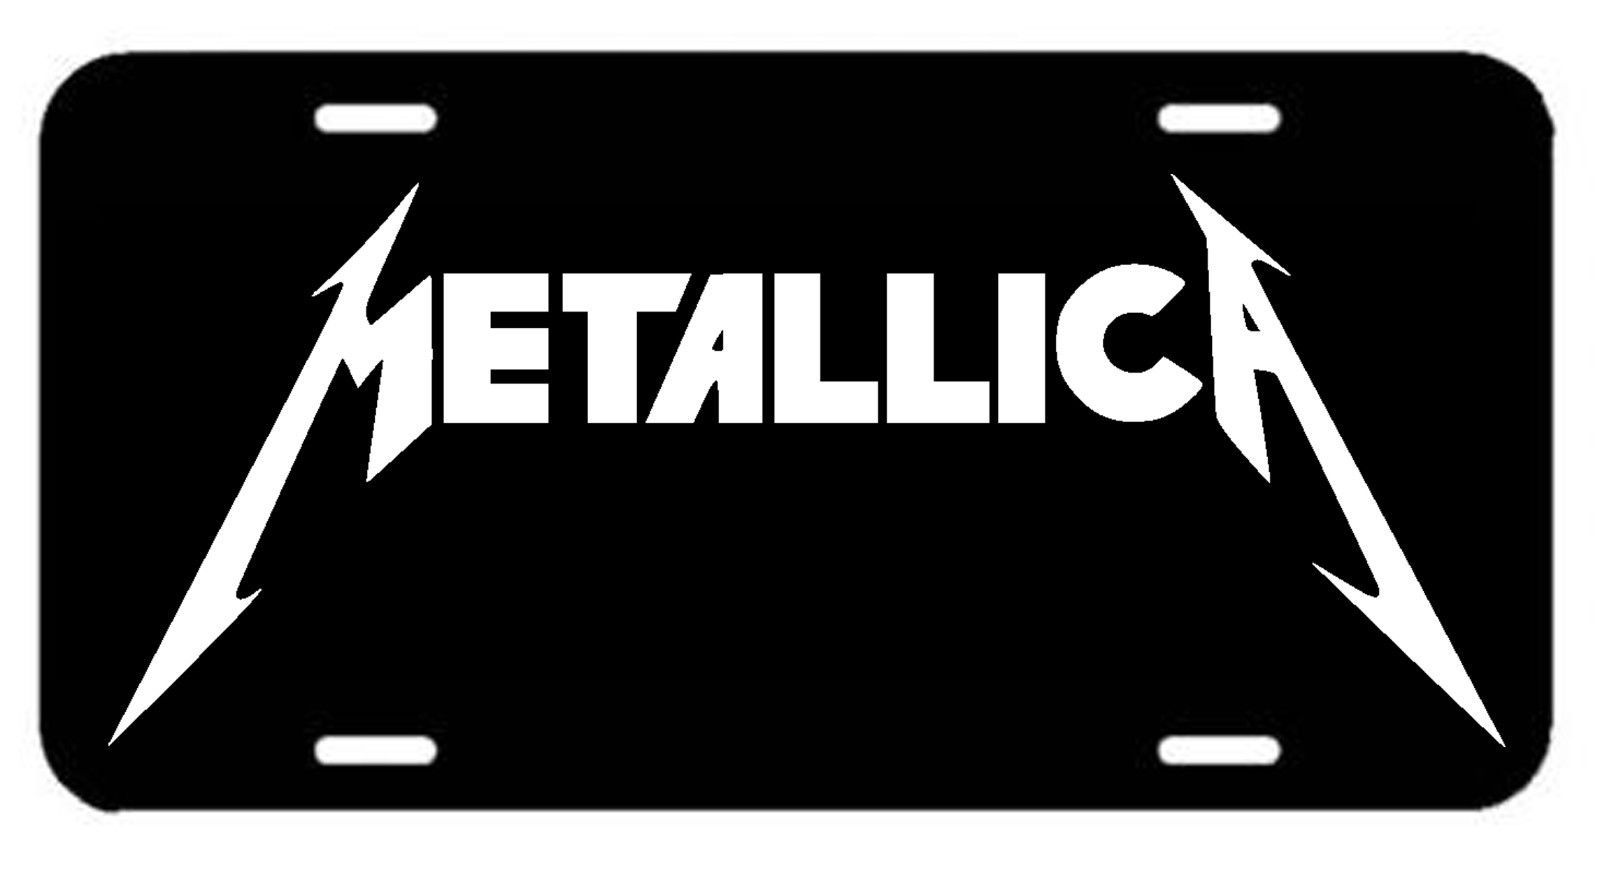 Seether 5FDP Metallica VOLBEAT ~ License Plate//Tag ~  car//truck//auto//garage